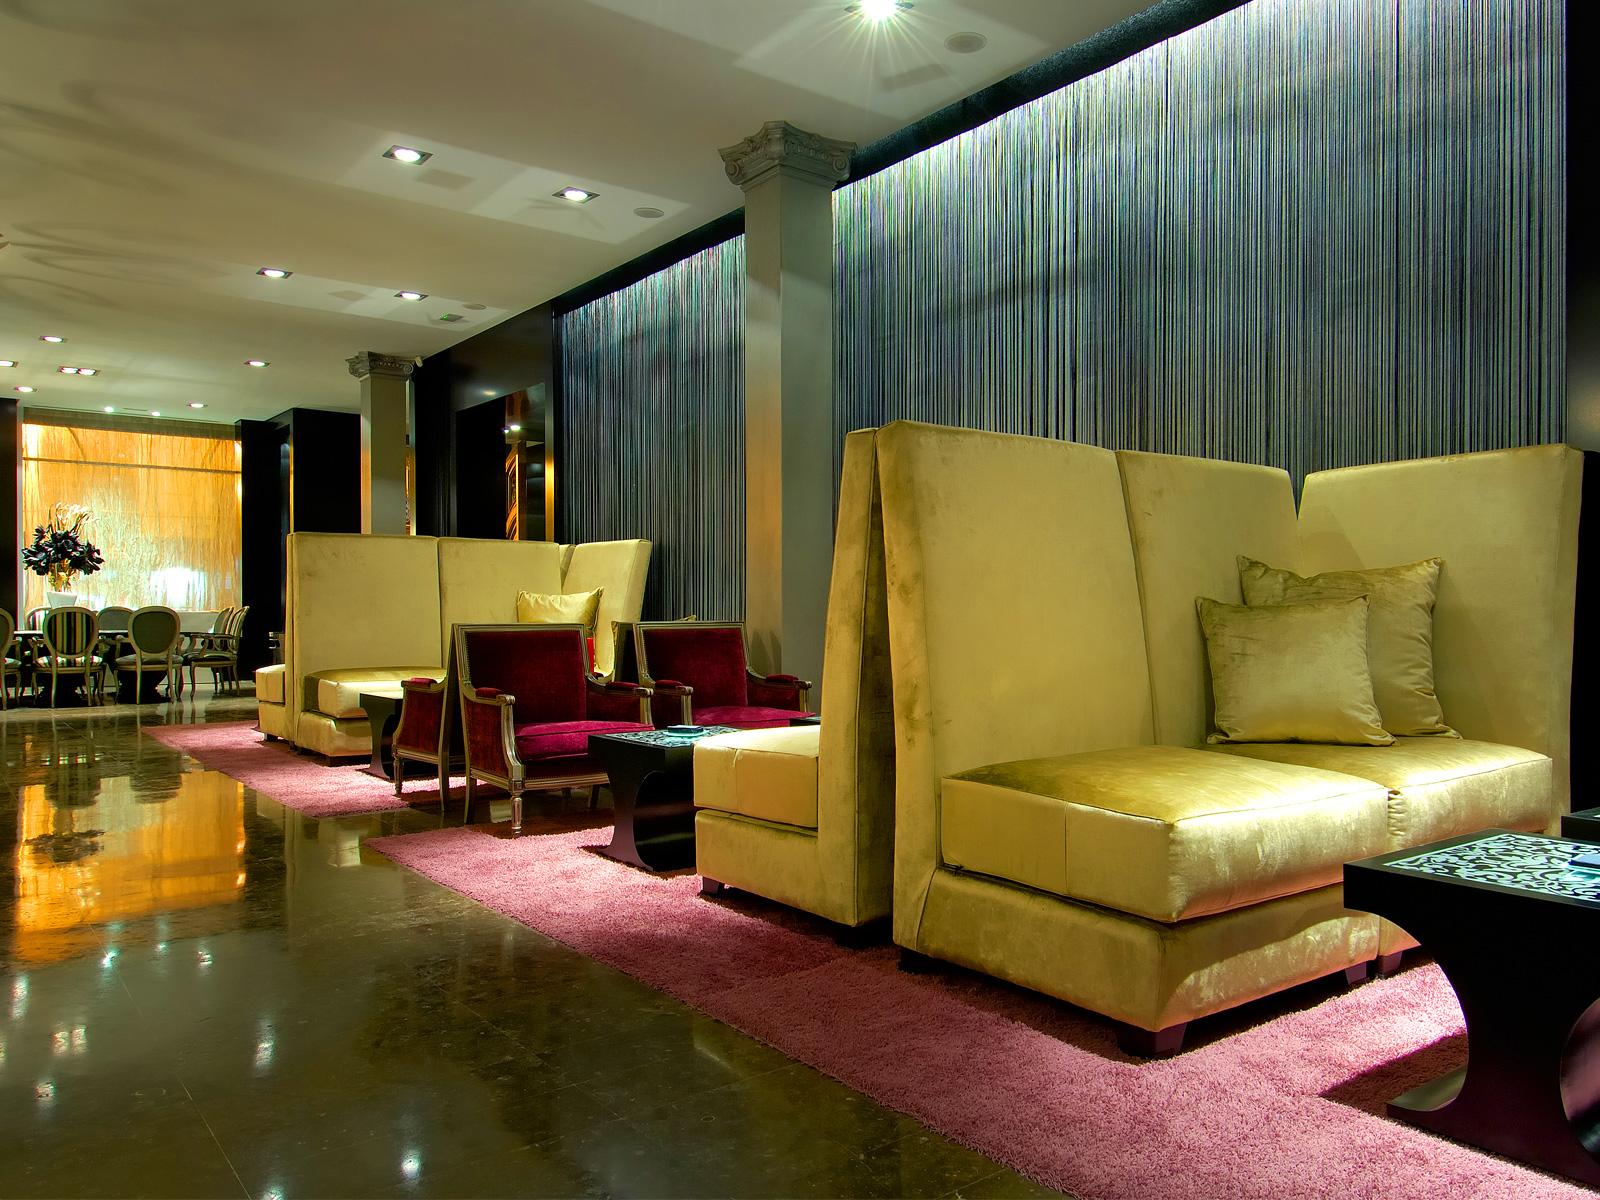 Il Lounge - Vincci Palace 4*